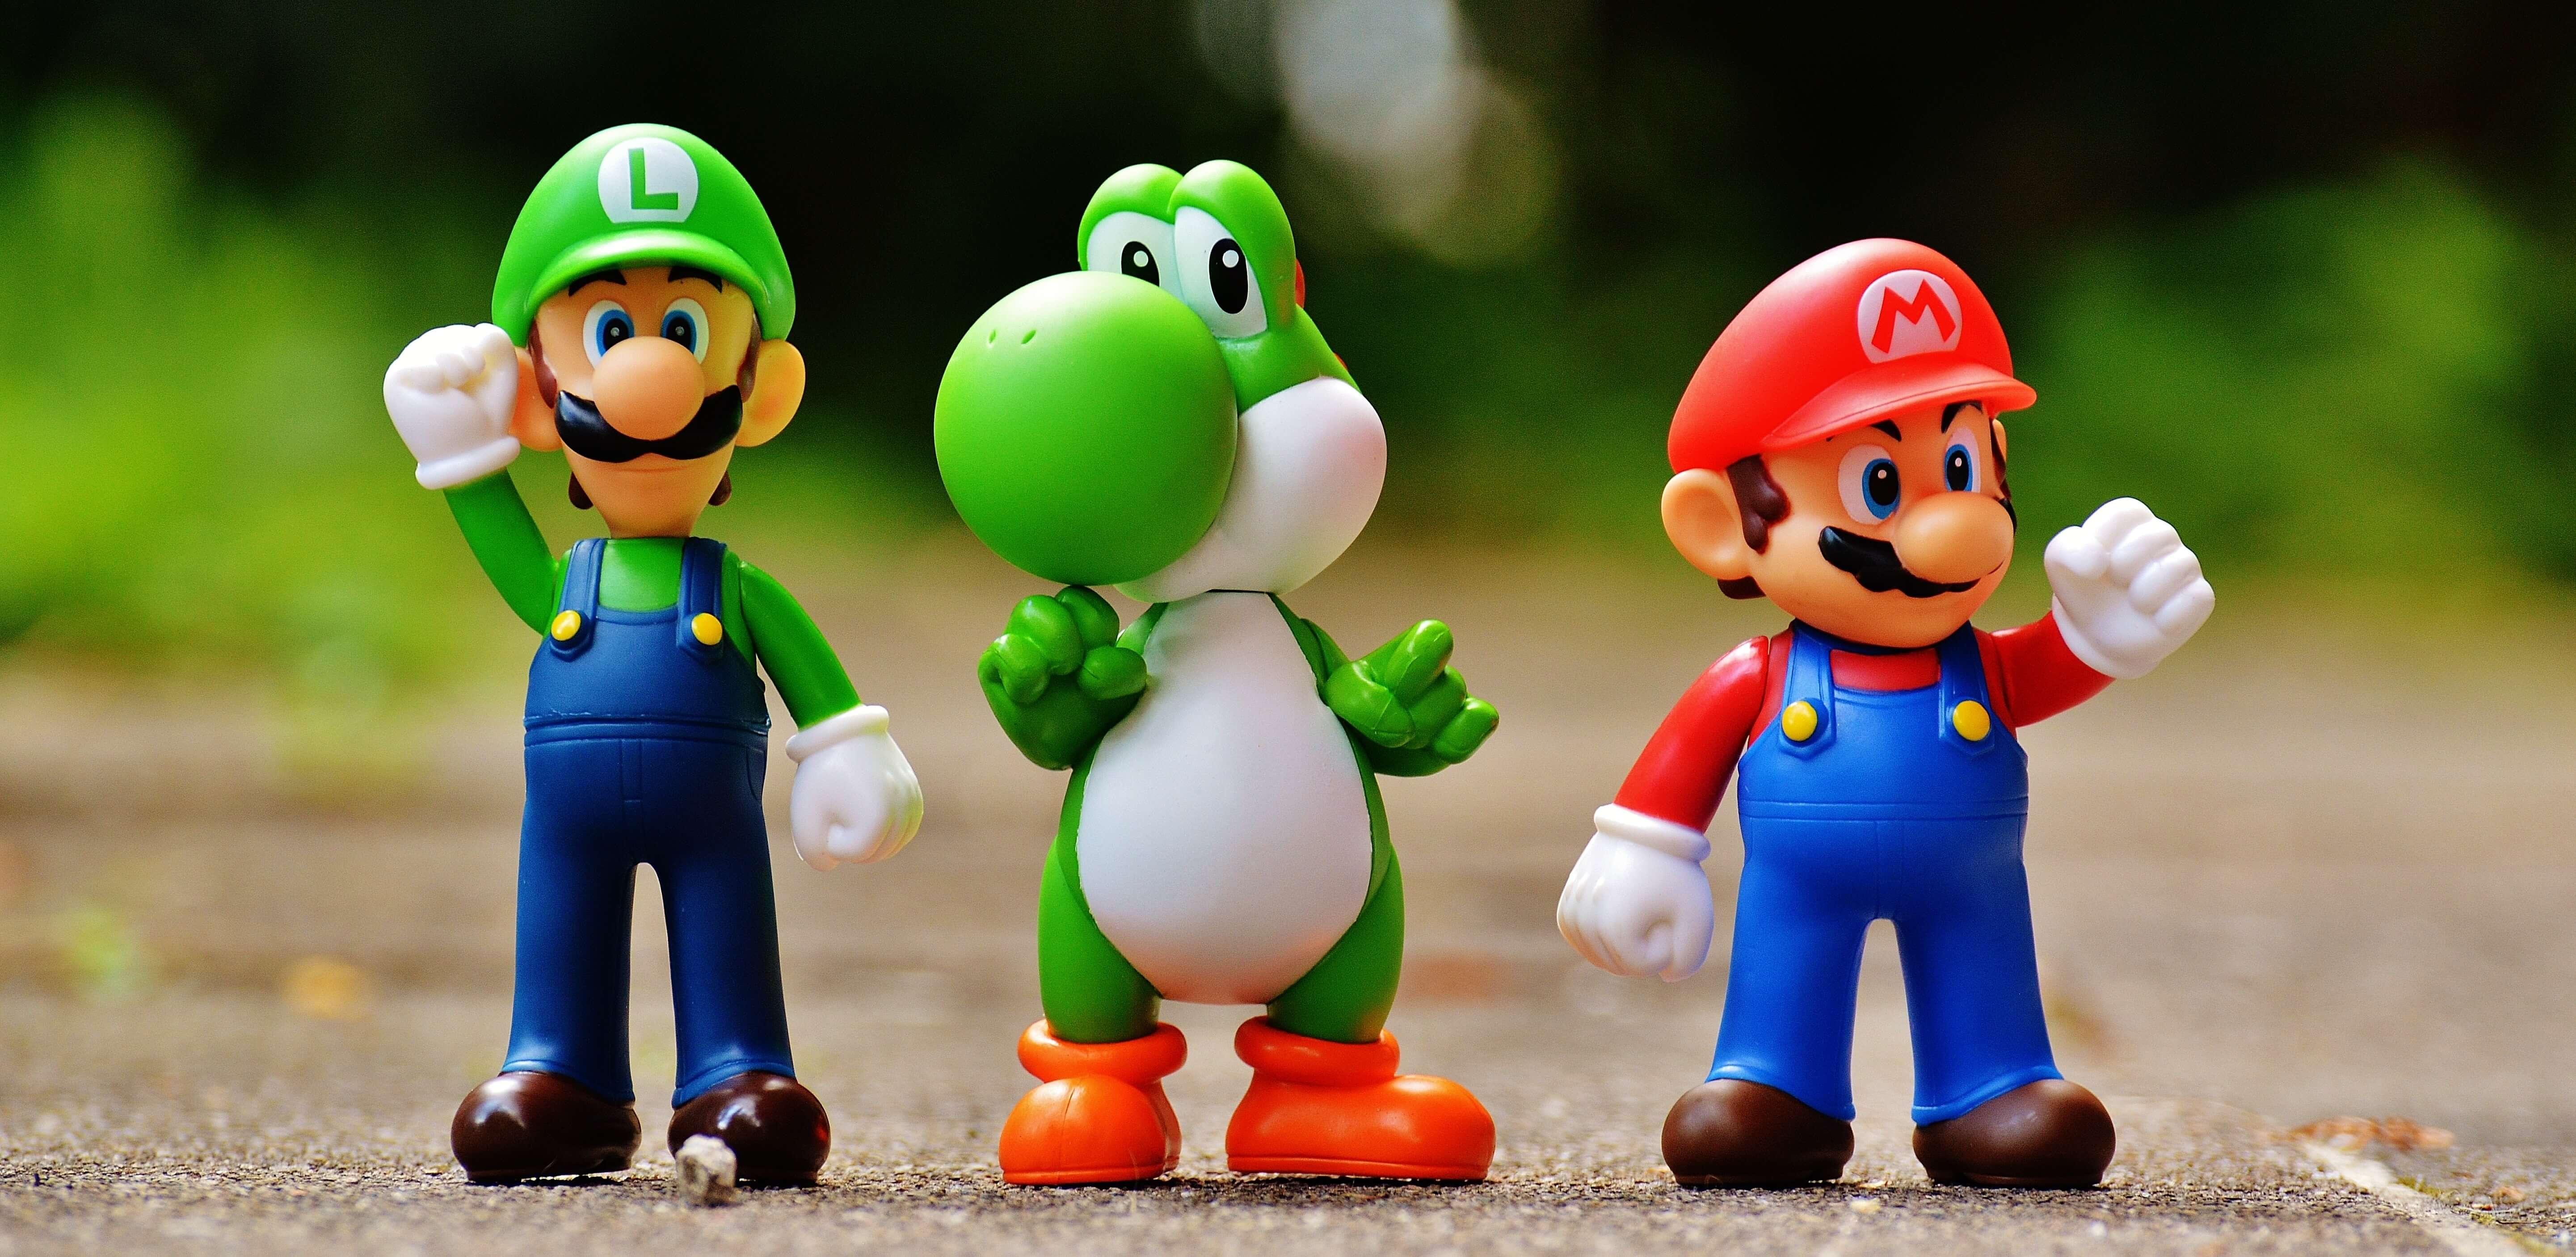 Mario, Luigi and Yoshi –protagonists from the Nintendo classic: Super Mario